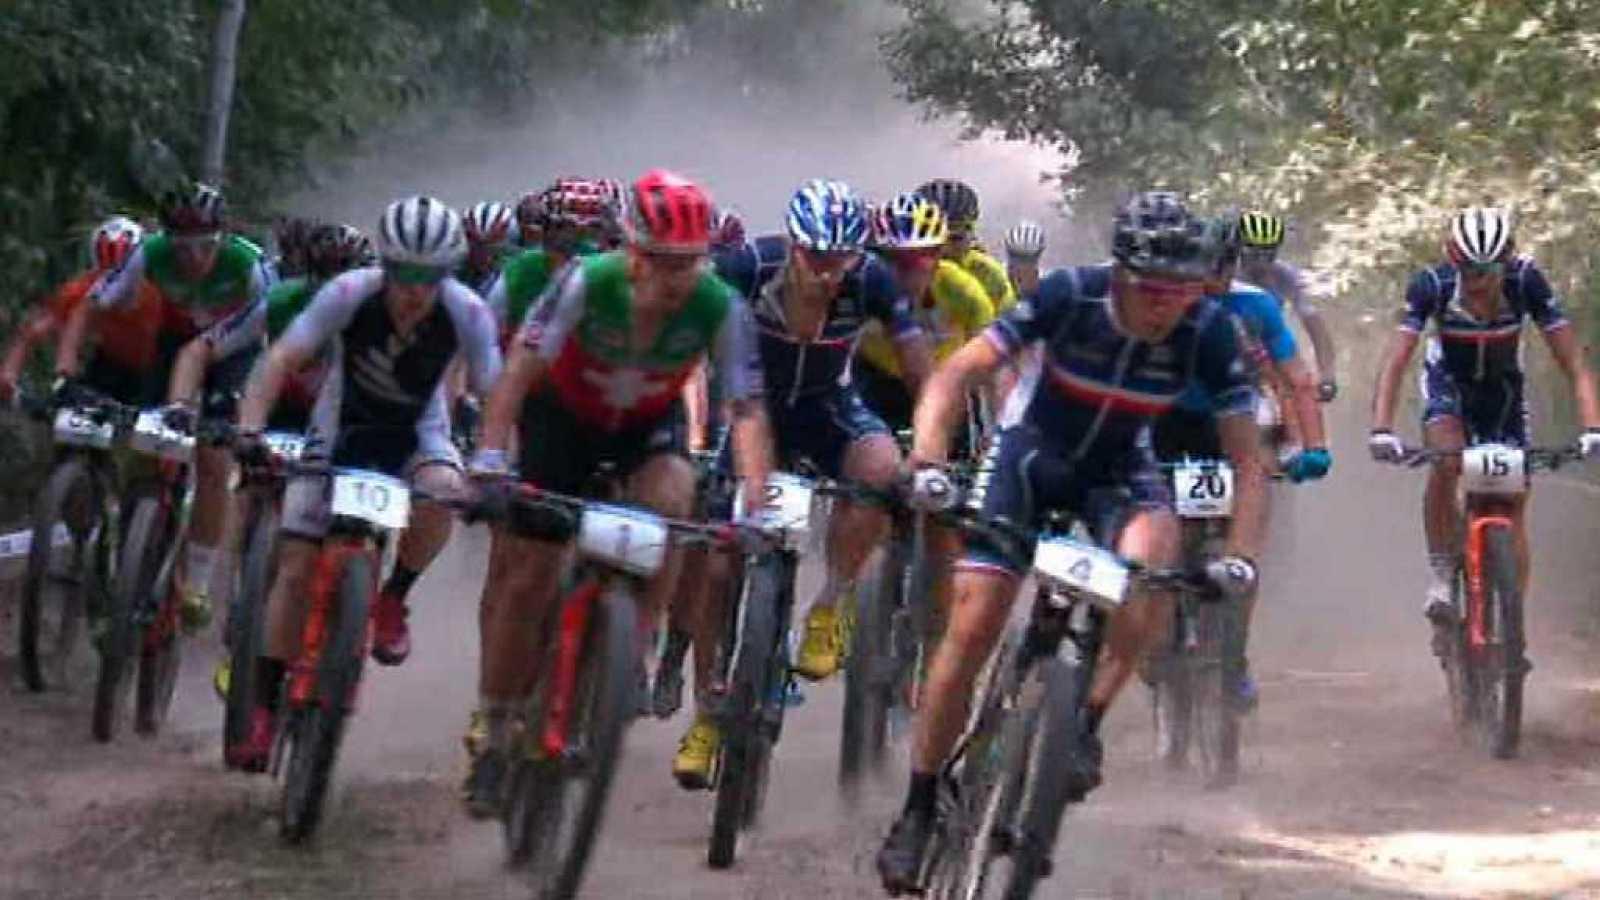 Circuito Xco Moralzarzal : Mountain bike campeonato del mundo. prueba cross country Élite